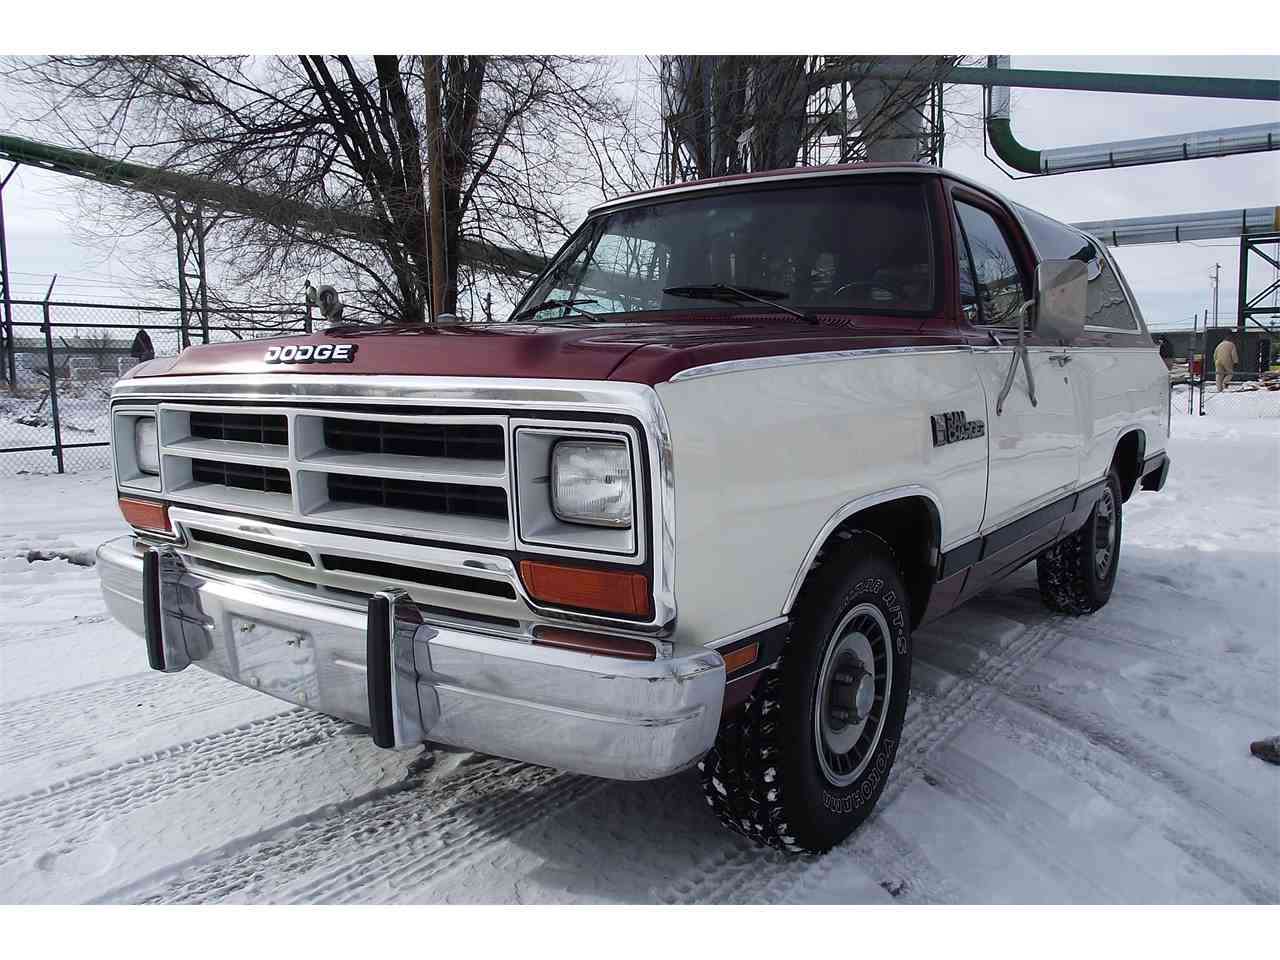 1987 dodge ramcharger 934563